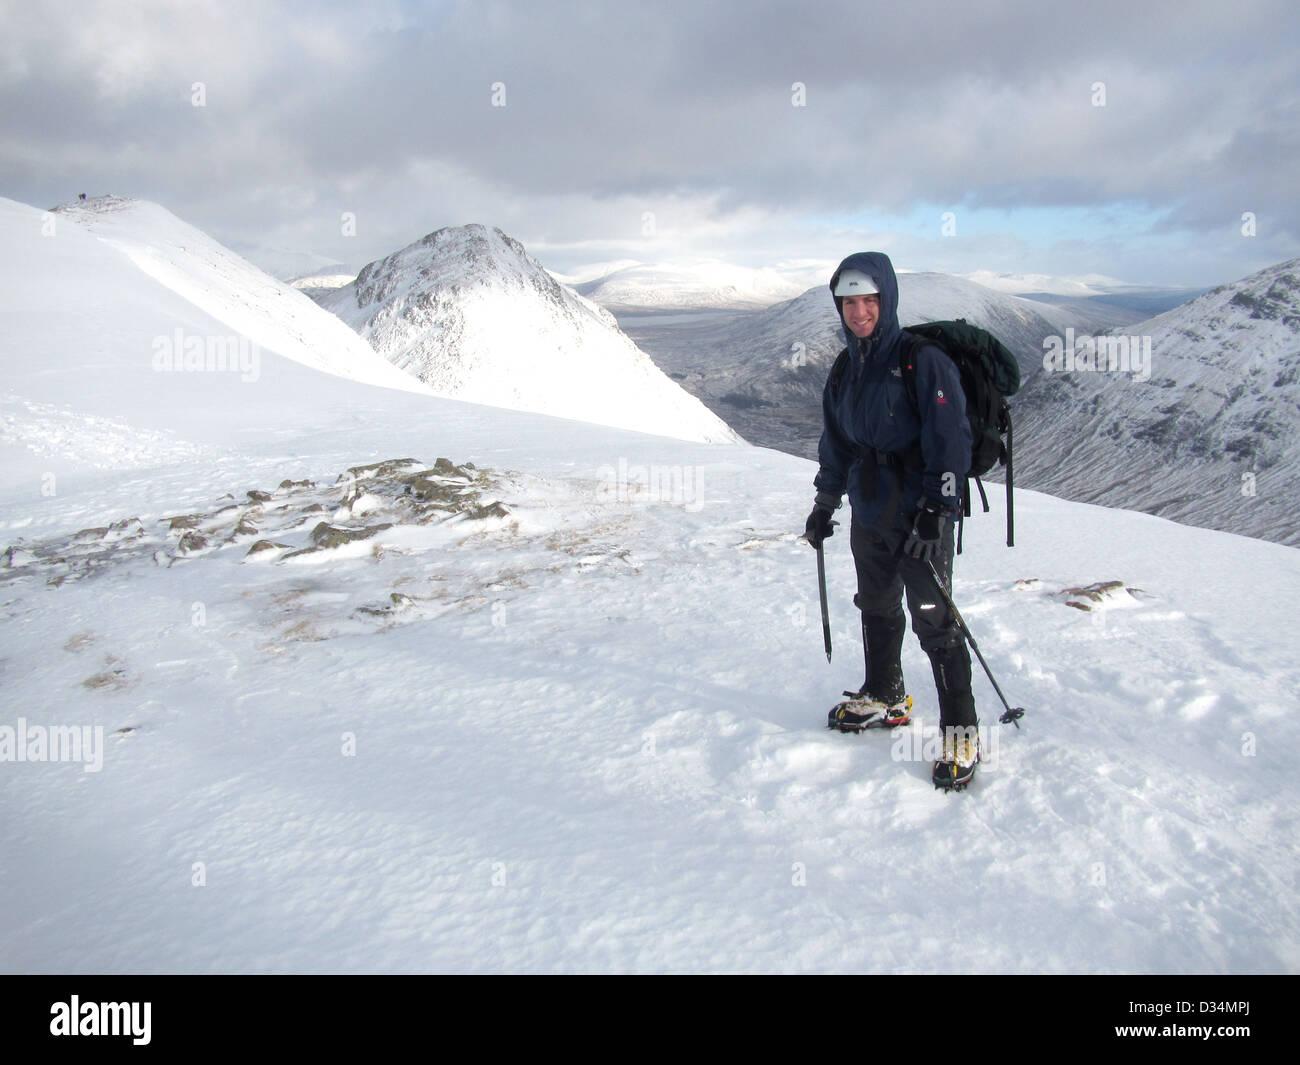 A mountaineer on the Scottish mountain Buachaille Etive Beag  in Glencoe  in Scottish highlands, Scotland UK Stock Photo